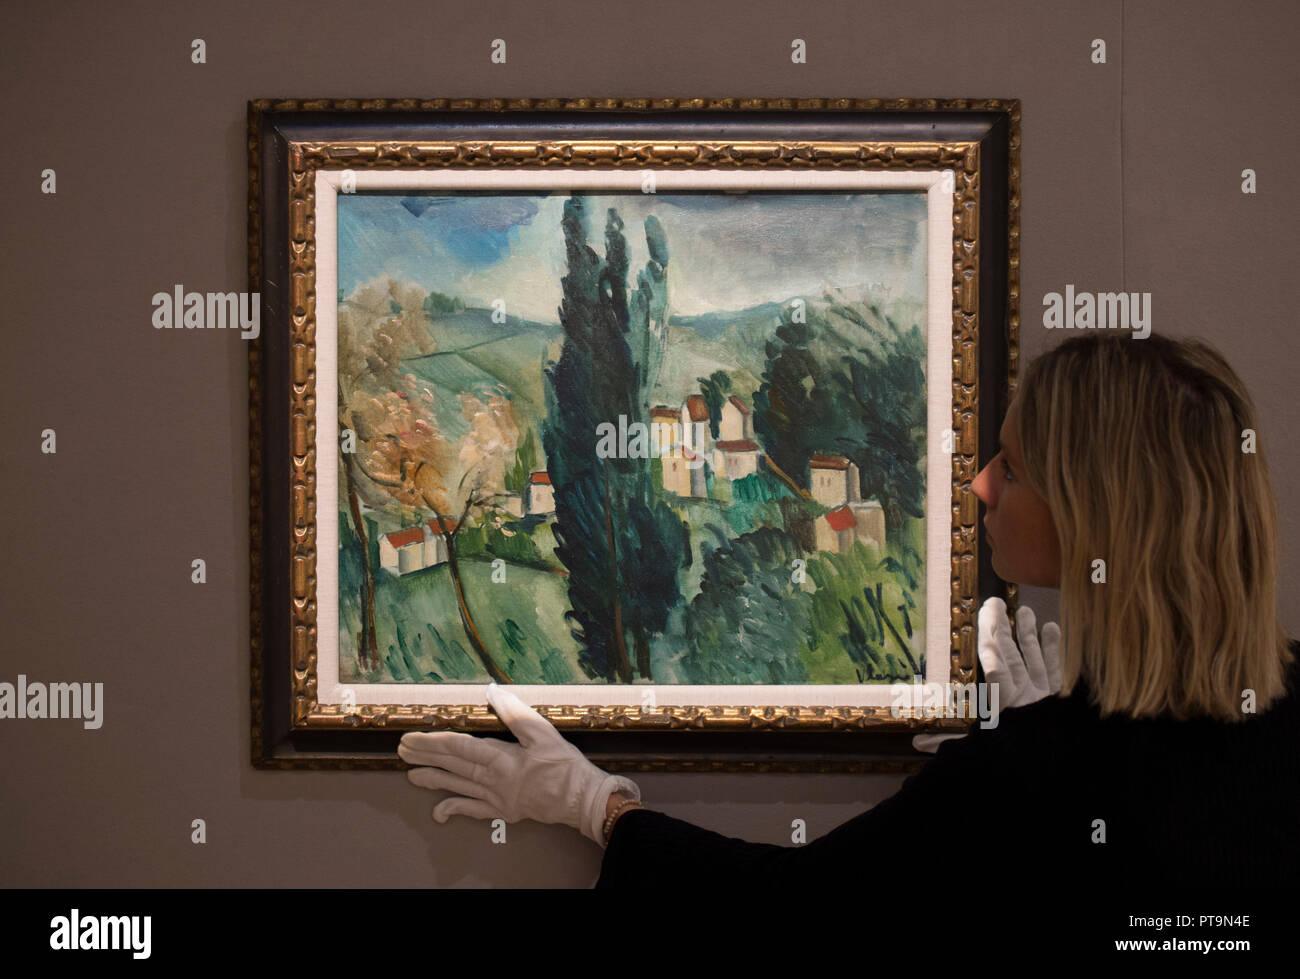 Bonhams, New Bond Street, London, UK. 8 October, 2018. Bonhams Impressionist and Modern Art Sale preview opens. Image: Maurice de Vlaminck, Paysage aux trois cyprès, estimated at £70,000-90,000. Credit: Malcolm Park/Alamy Live News. - Stock Image